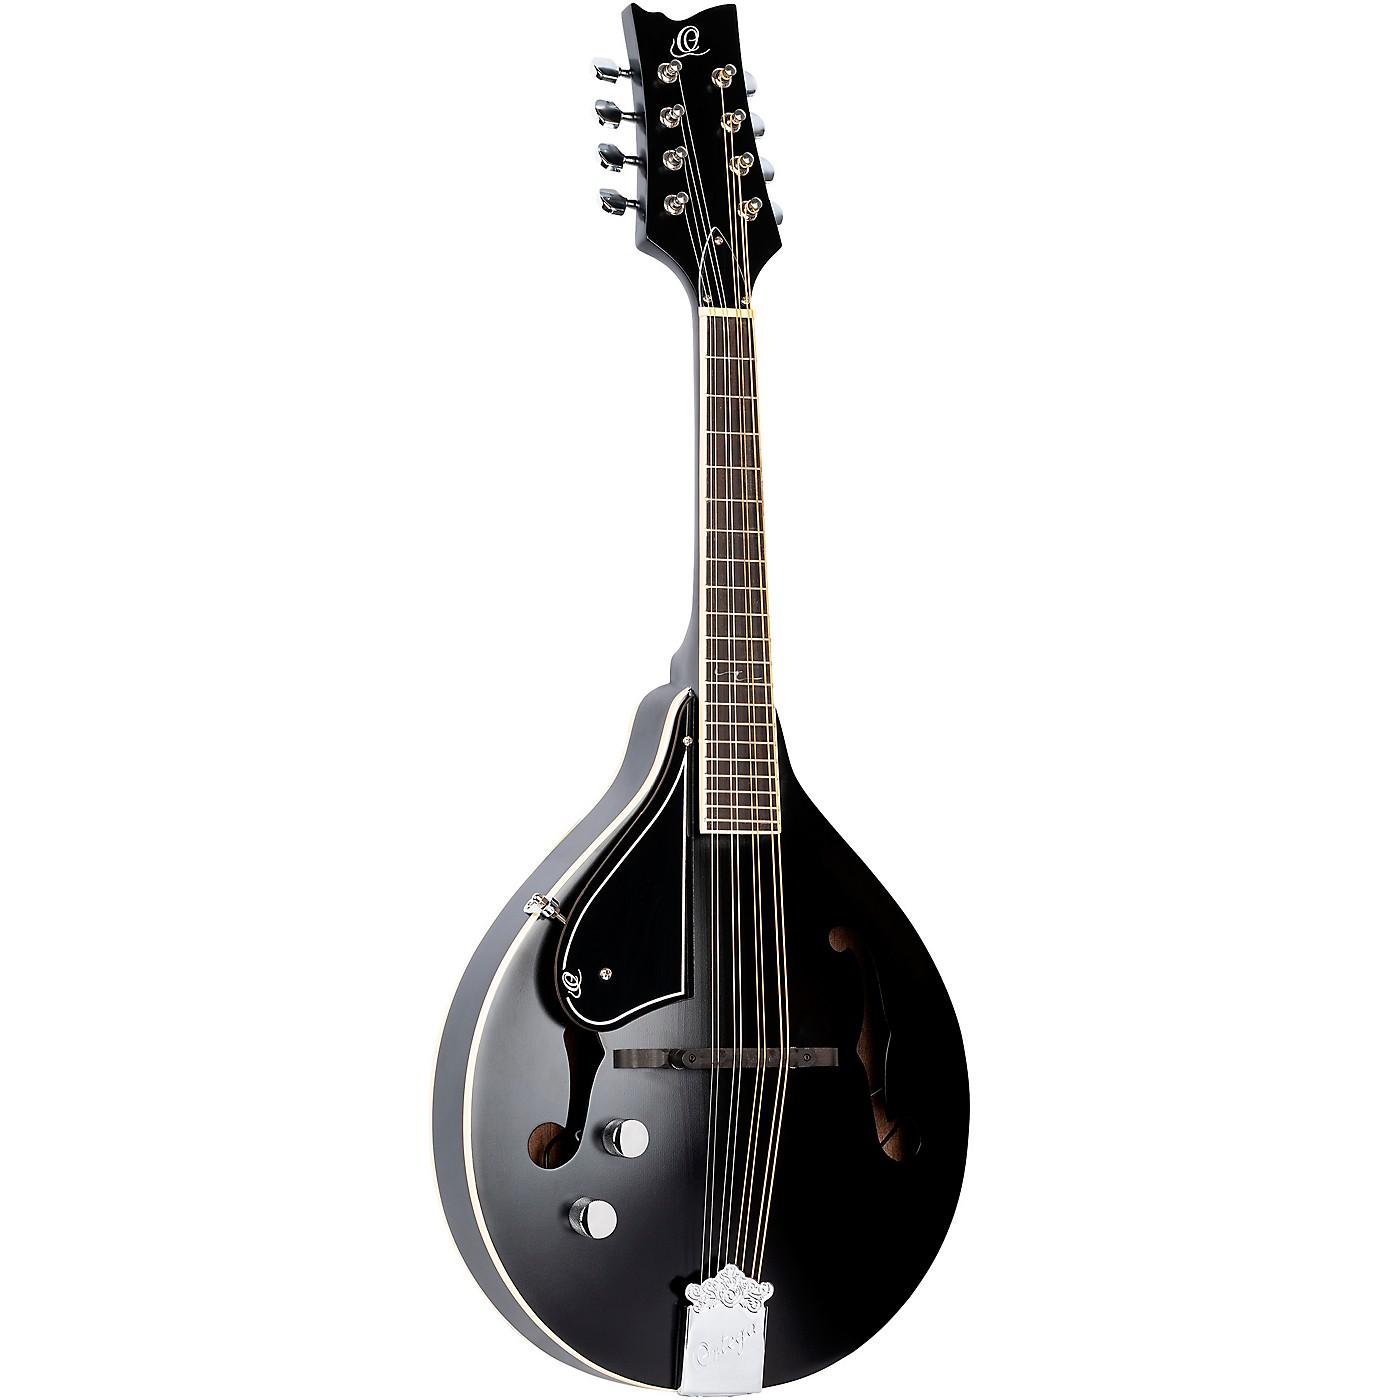 Ortega A-Style Series RMAE40SBK-L Left-Handed Acoustic Electric Mandolin thumbnail